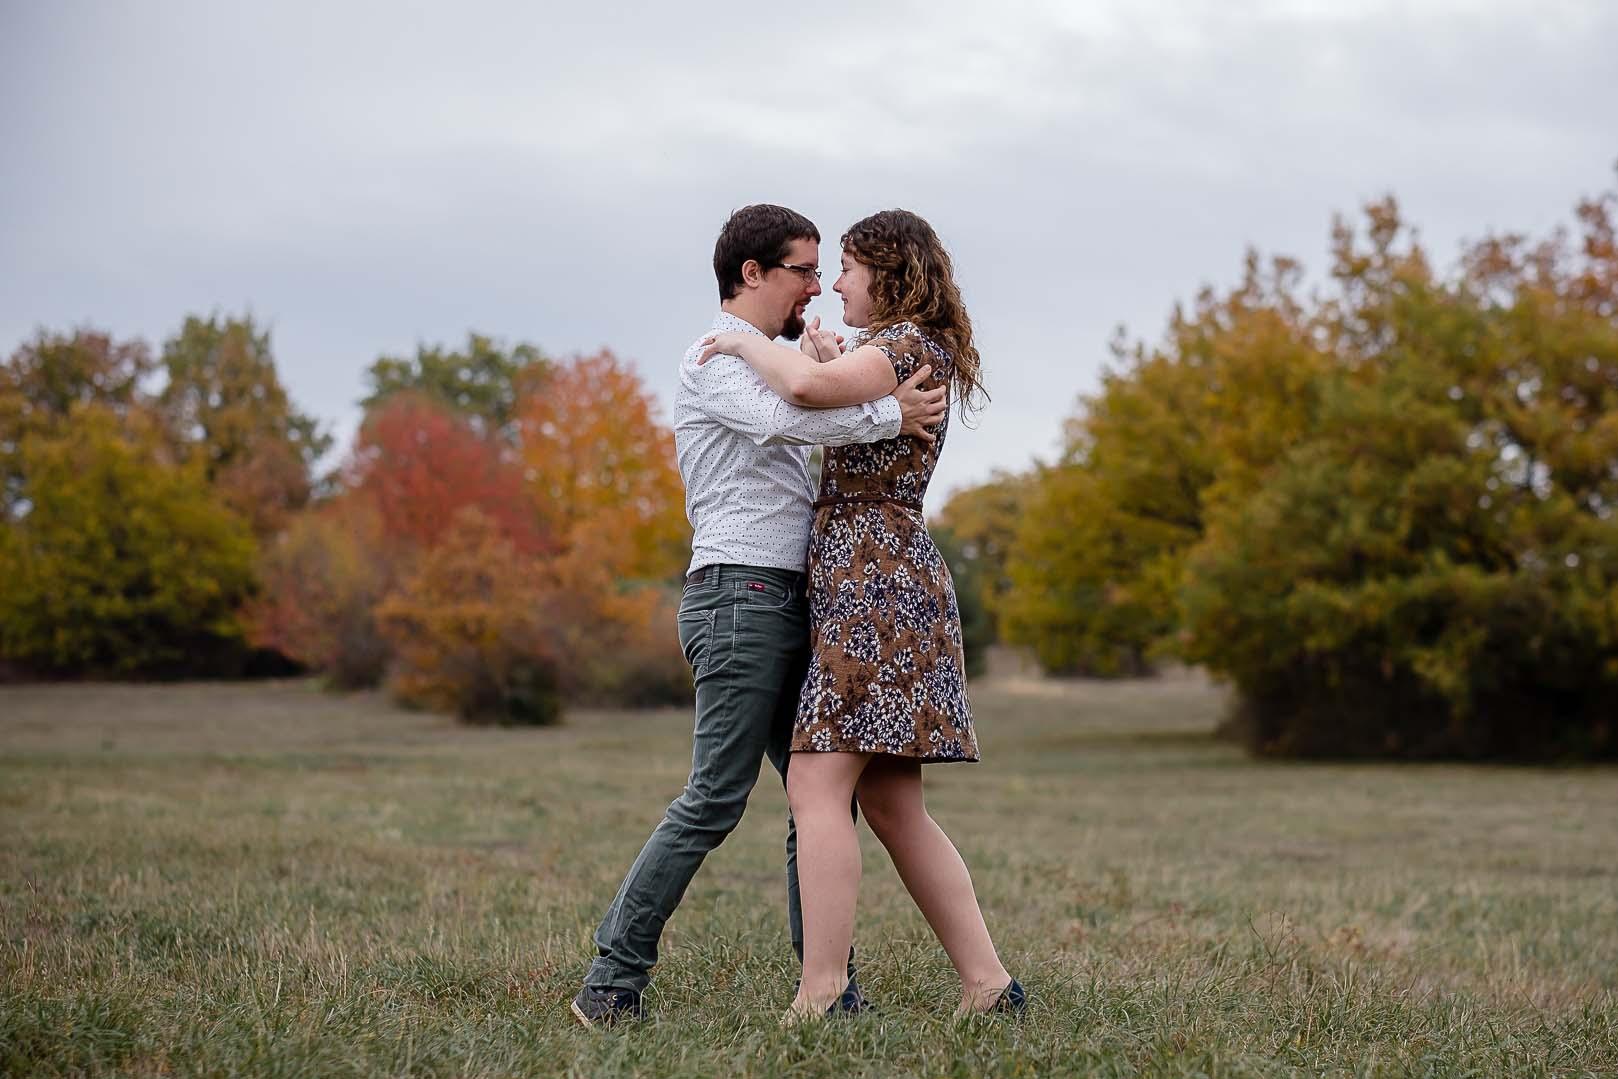 Steeve-Constanty-photographe-professionnel-mariage-couple-portrait-thann-cernay-mulhouse-colmar-guebwiller-soultz